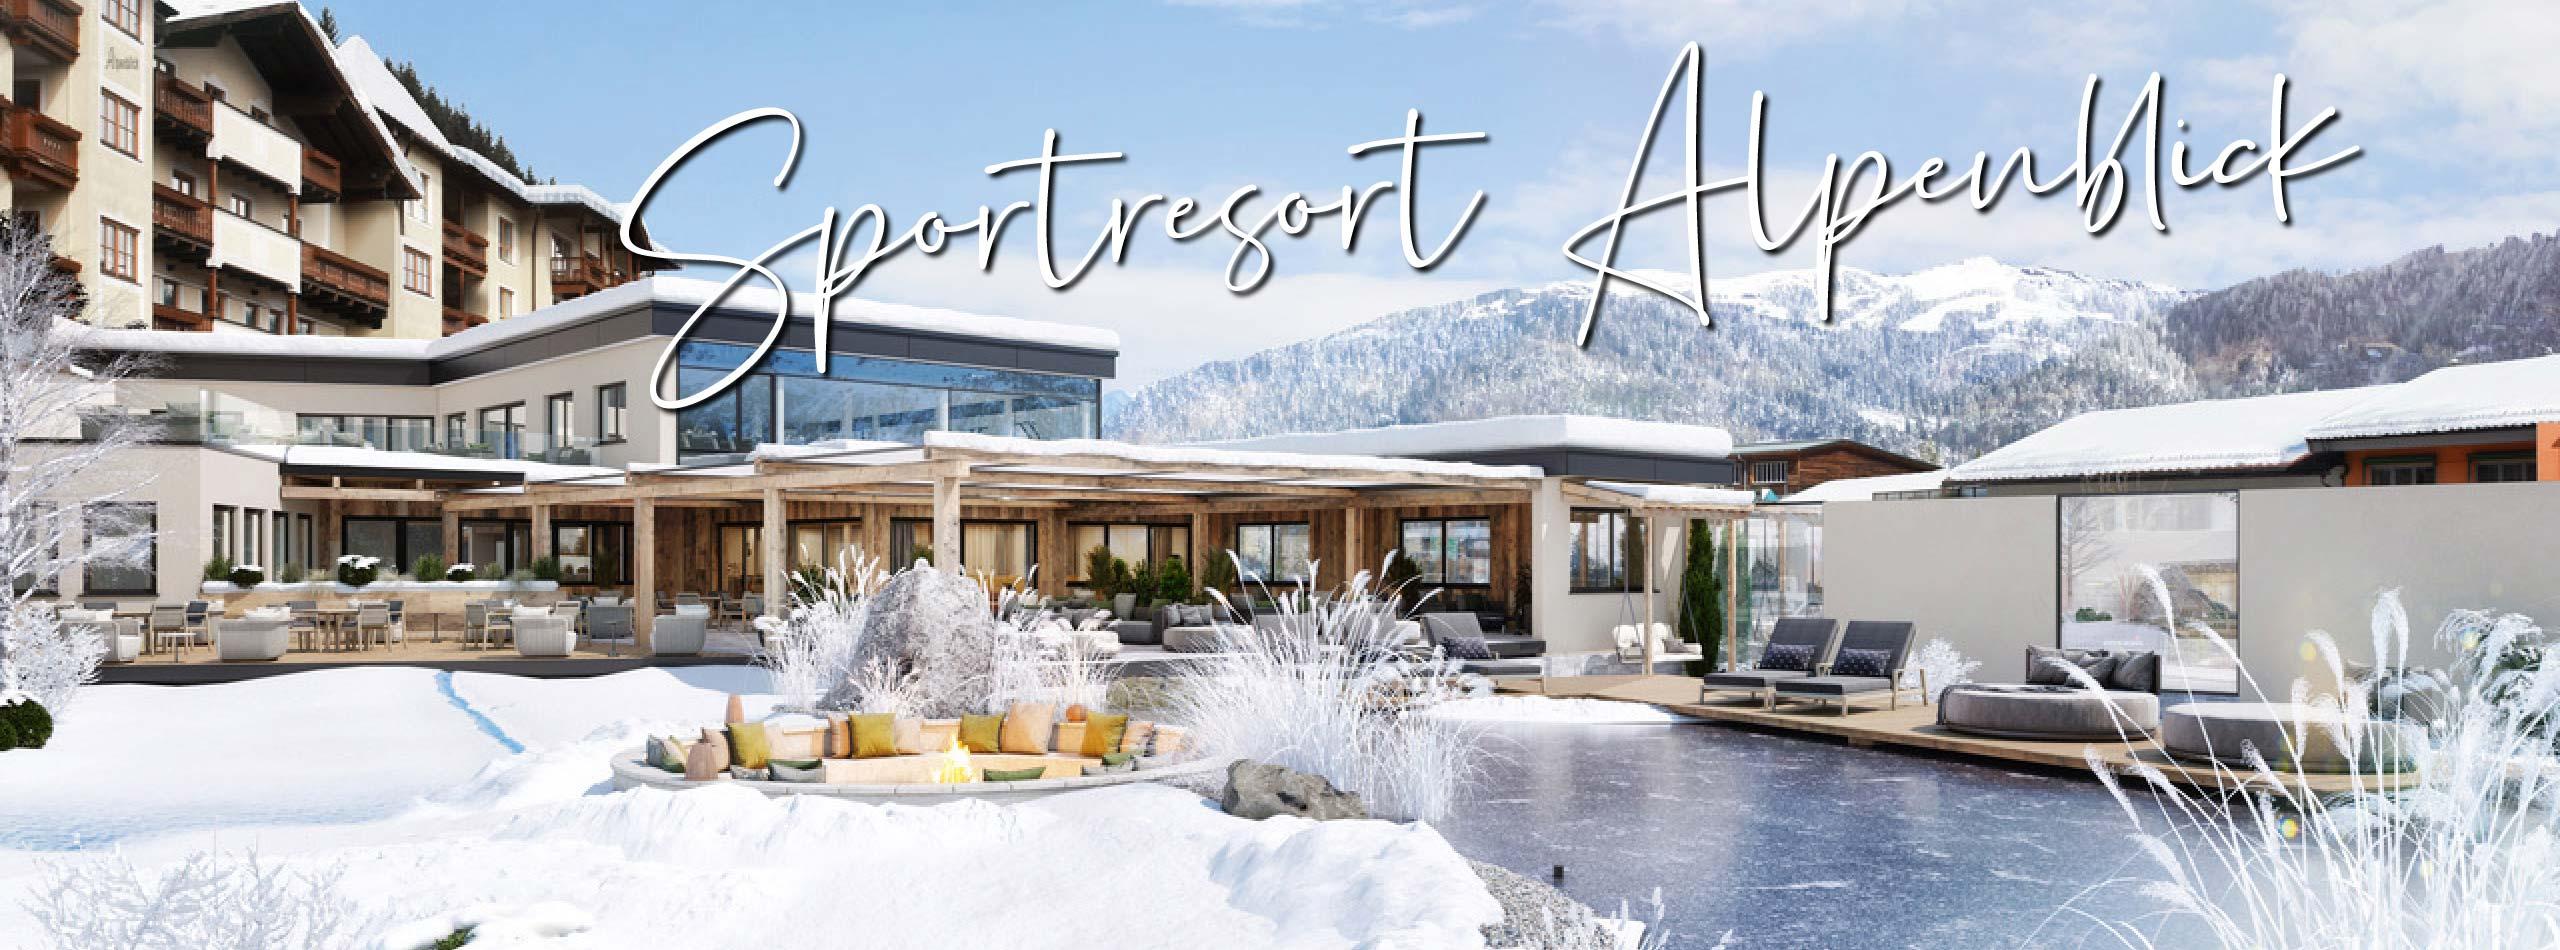 Sportresort Alpenblick Hotel Zell am See Austria Header Niche Destinations 2